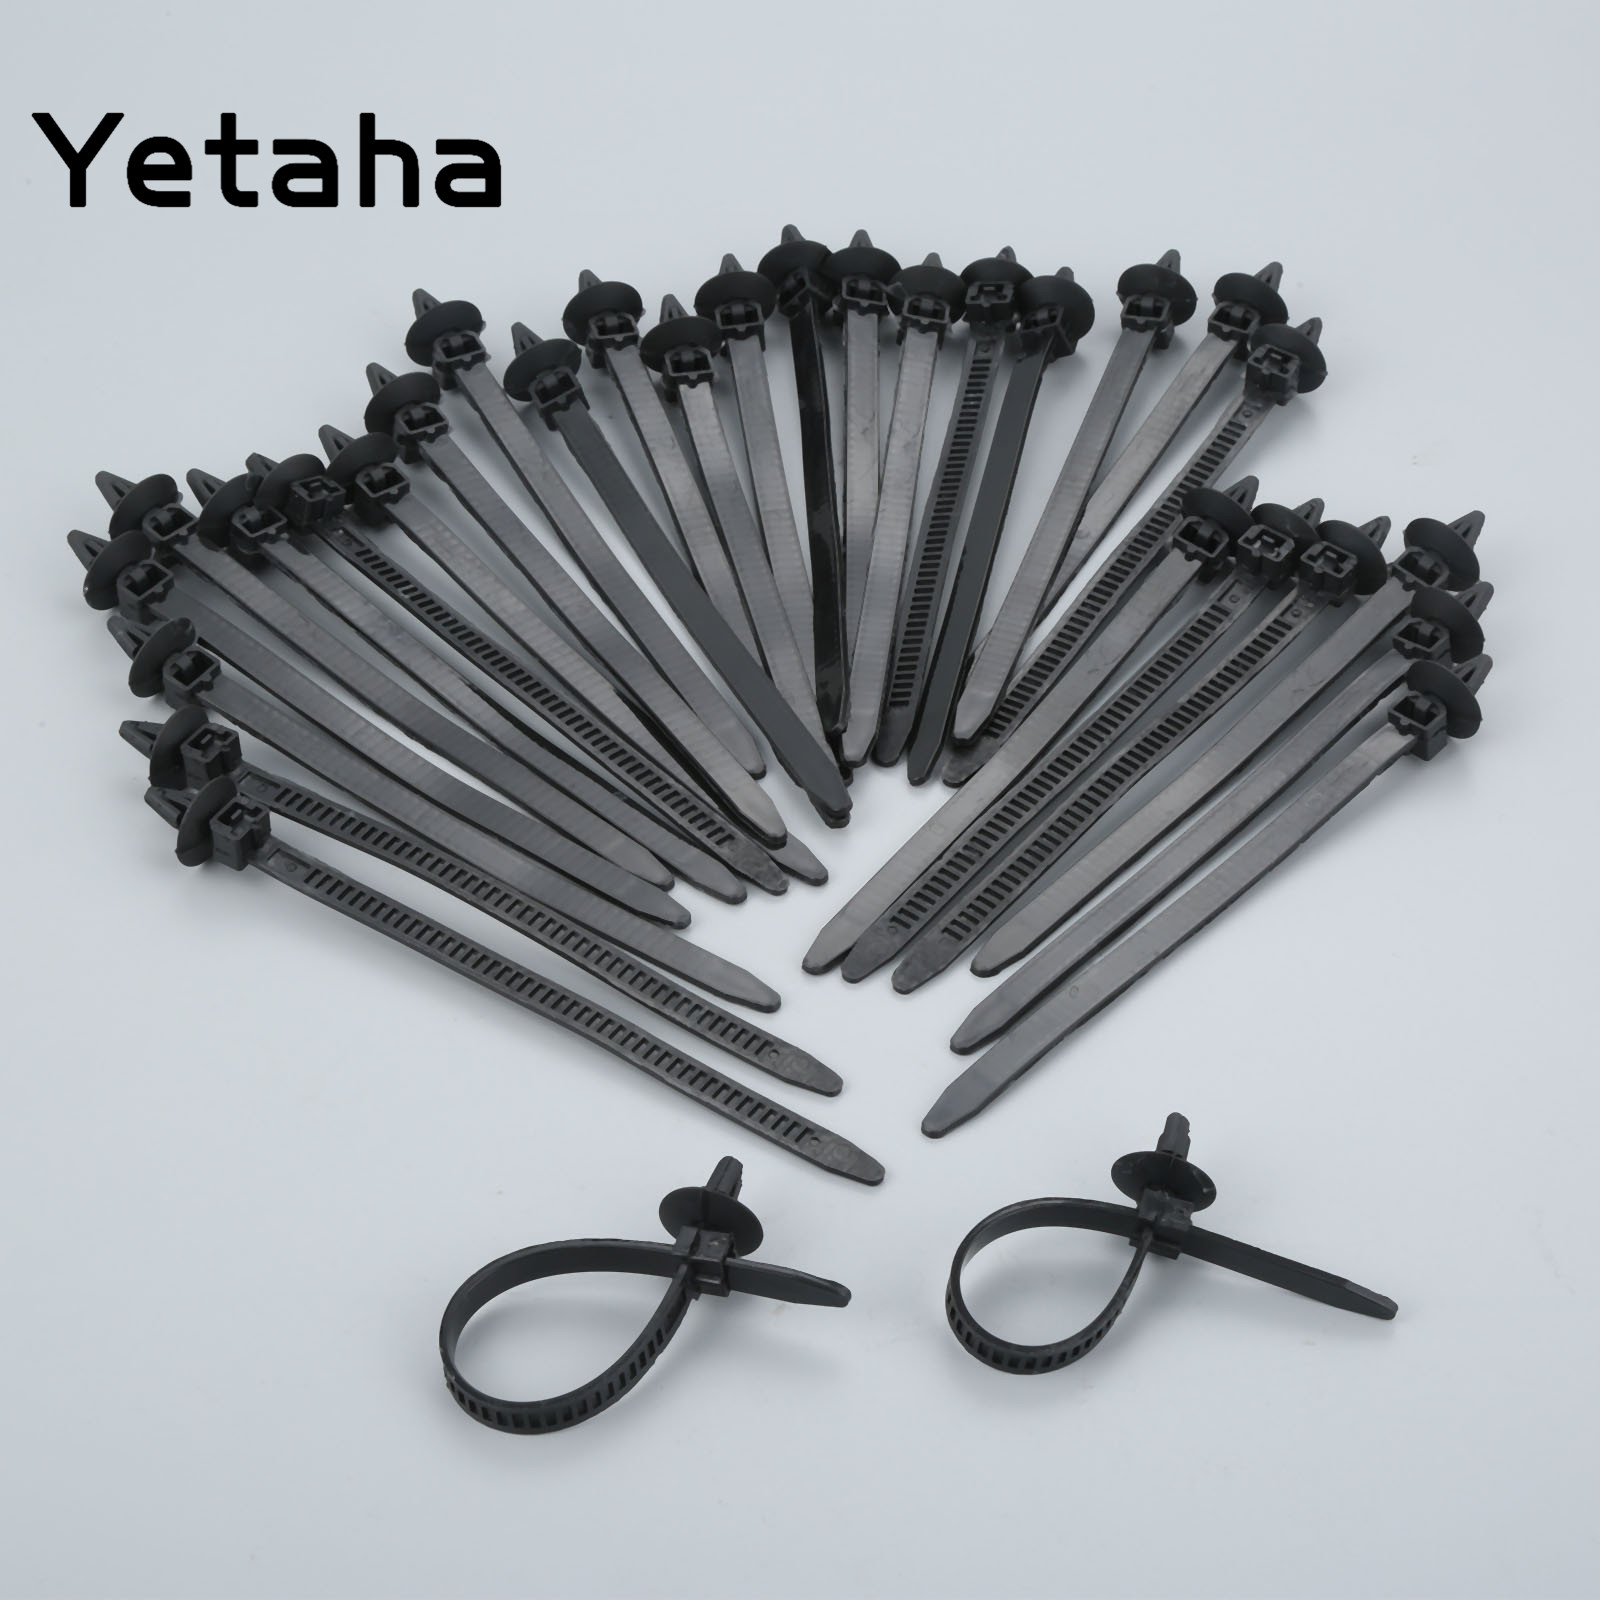 yetaha 30 pcs nylon black car auto cable strap push mount wire tie retainer clip clamp [ 1600 x 1600 Pixel ]